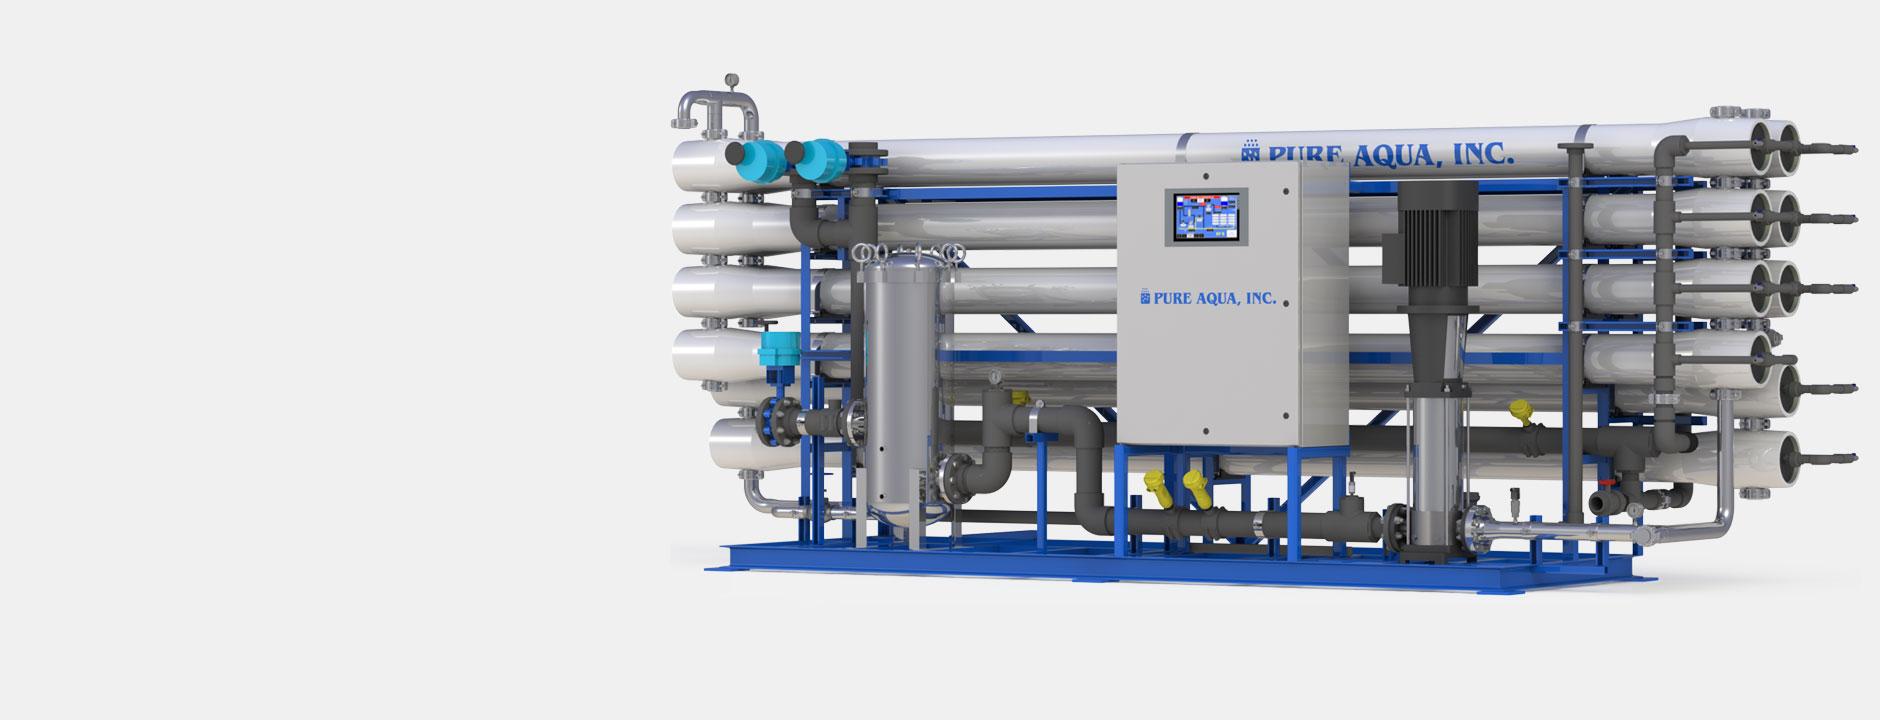 industrial reverse osmosis systems أنظمة التناضح العكسى الصناعية و التجارية